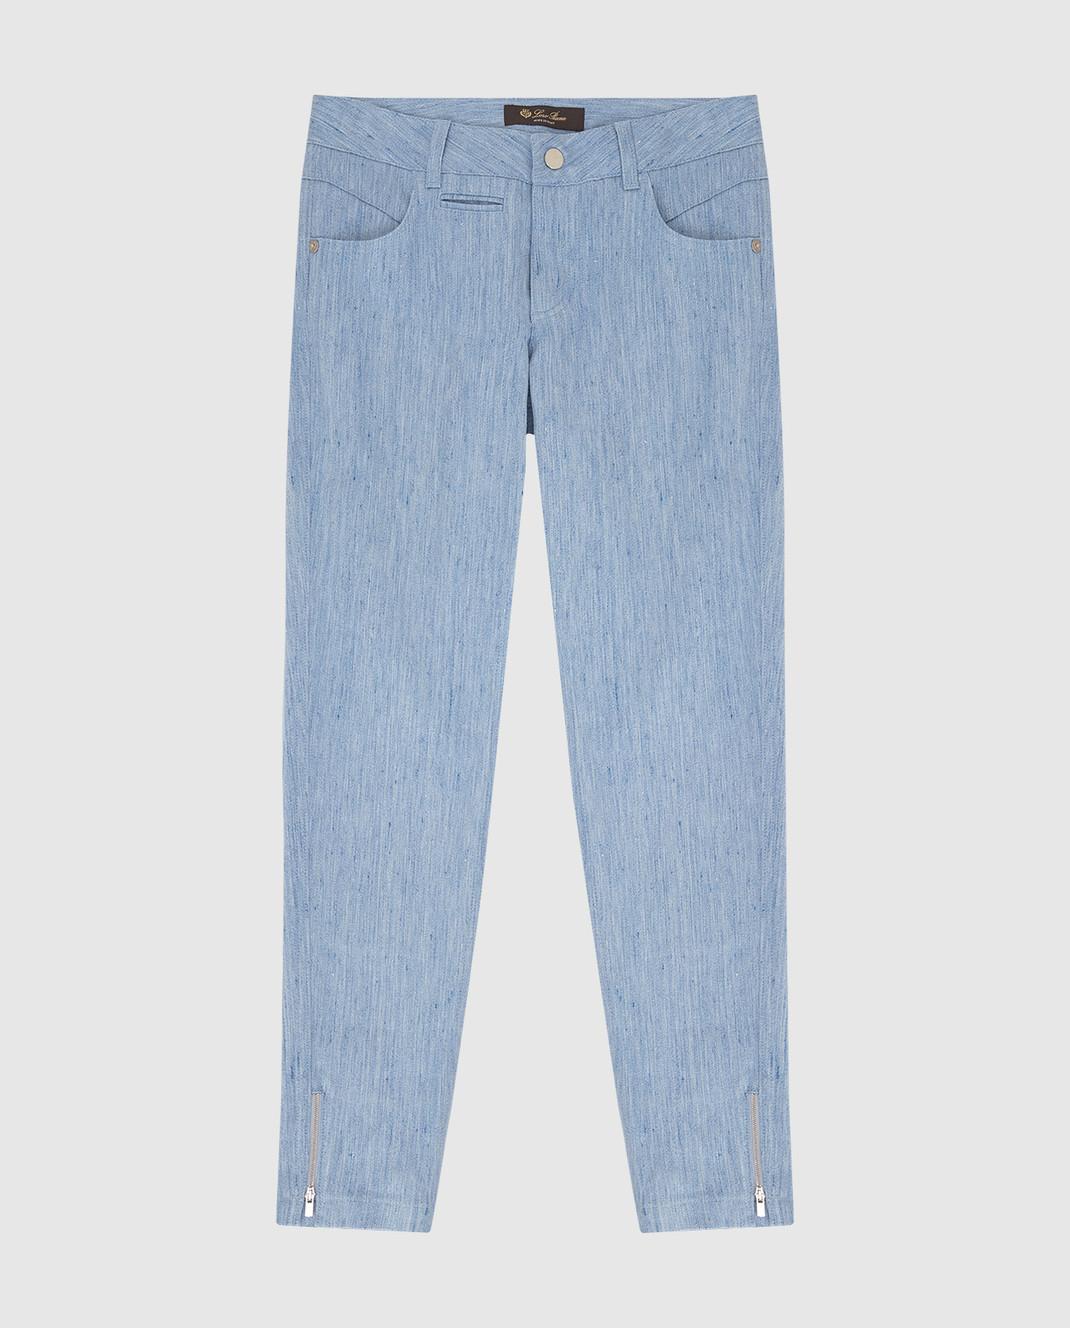 Loro Piana Детские голубые джинсы F1FAI0907